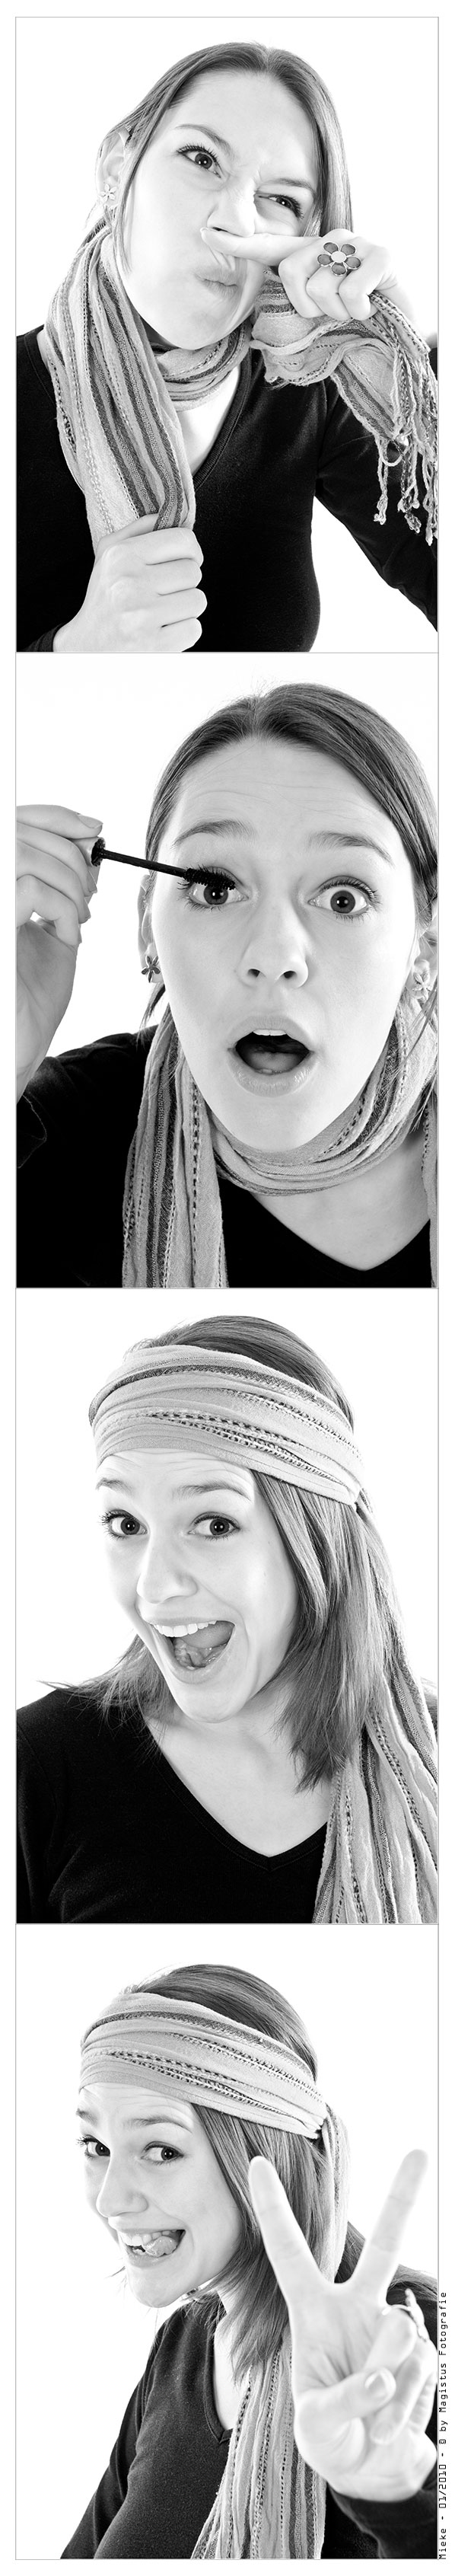 PhotoBooth - Mieke 01/2010 - by Magistus